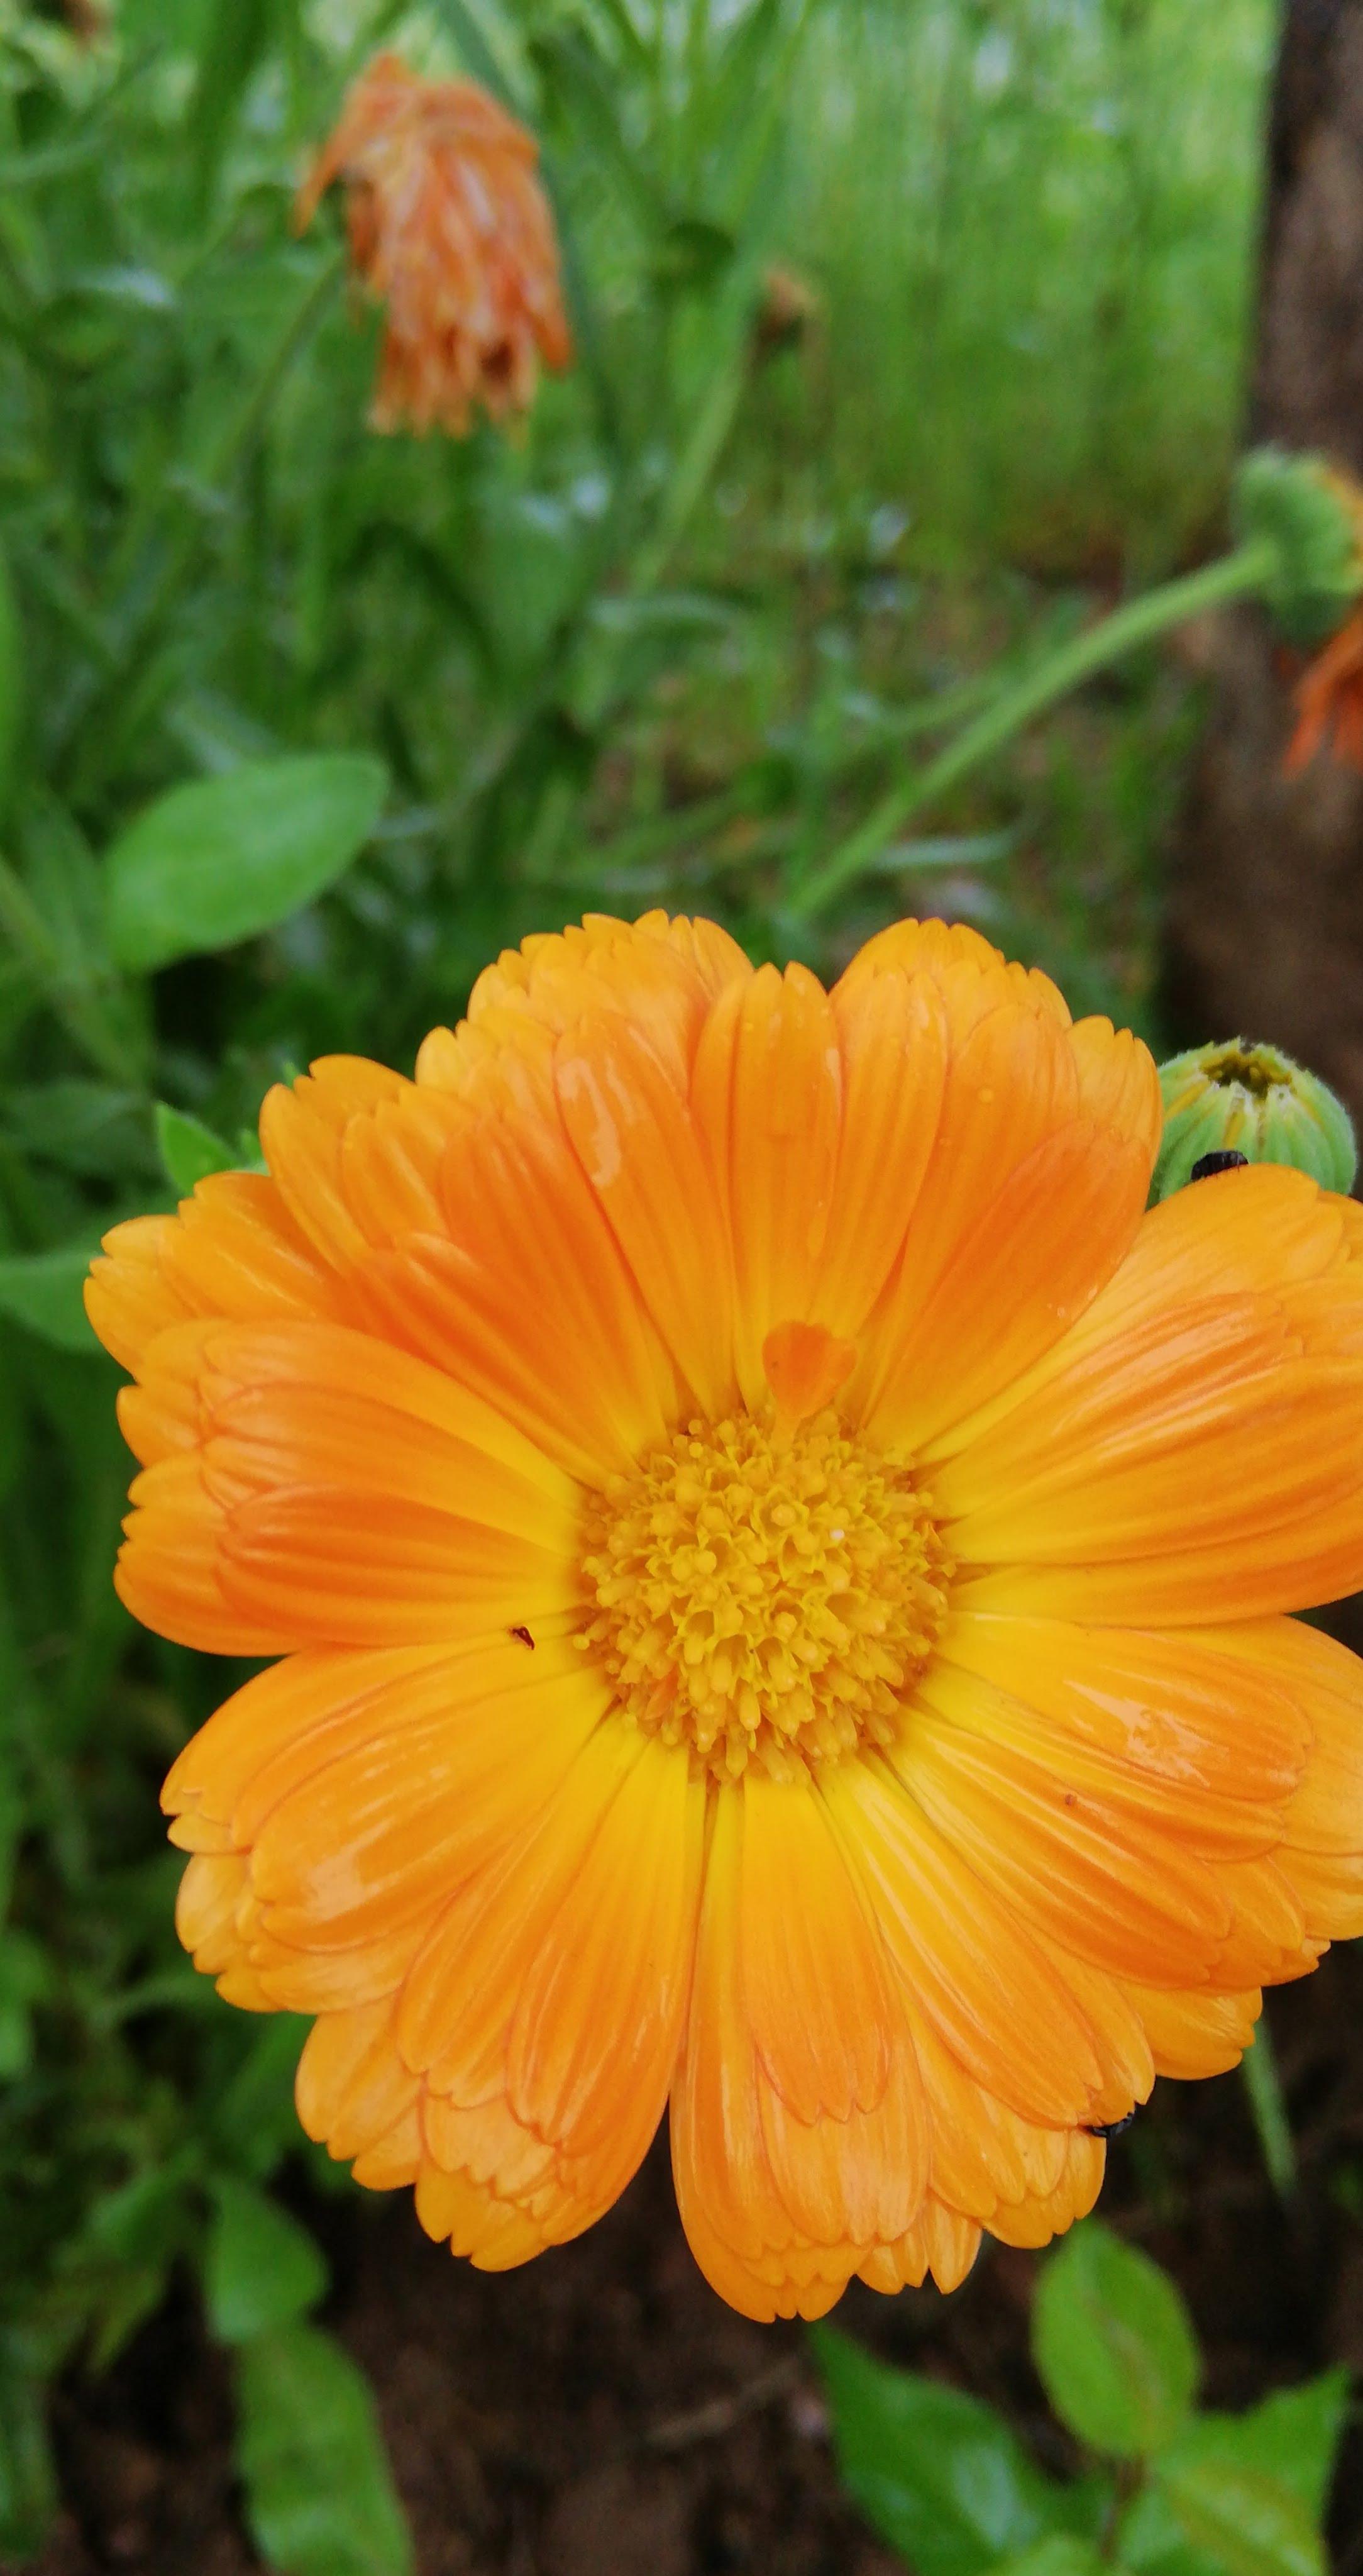 Free Images Flower Flowering Plant Petal Yellow English